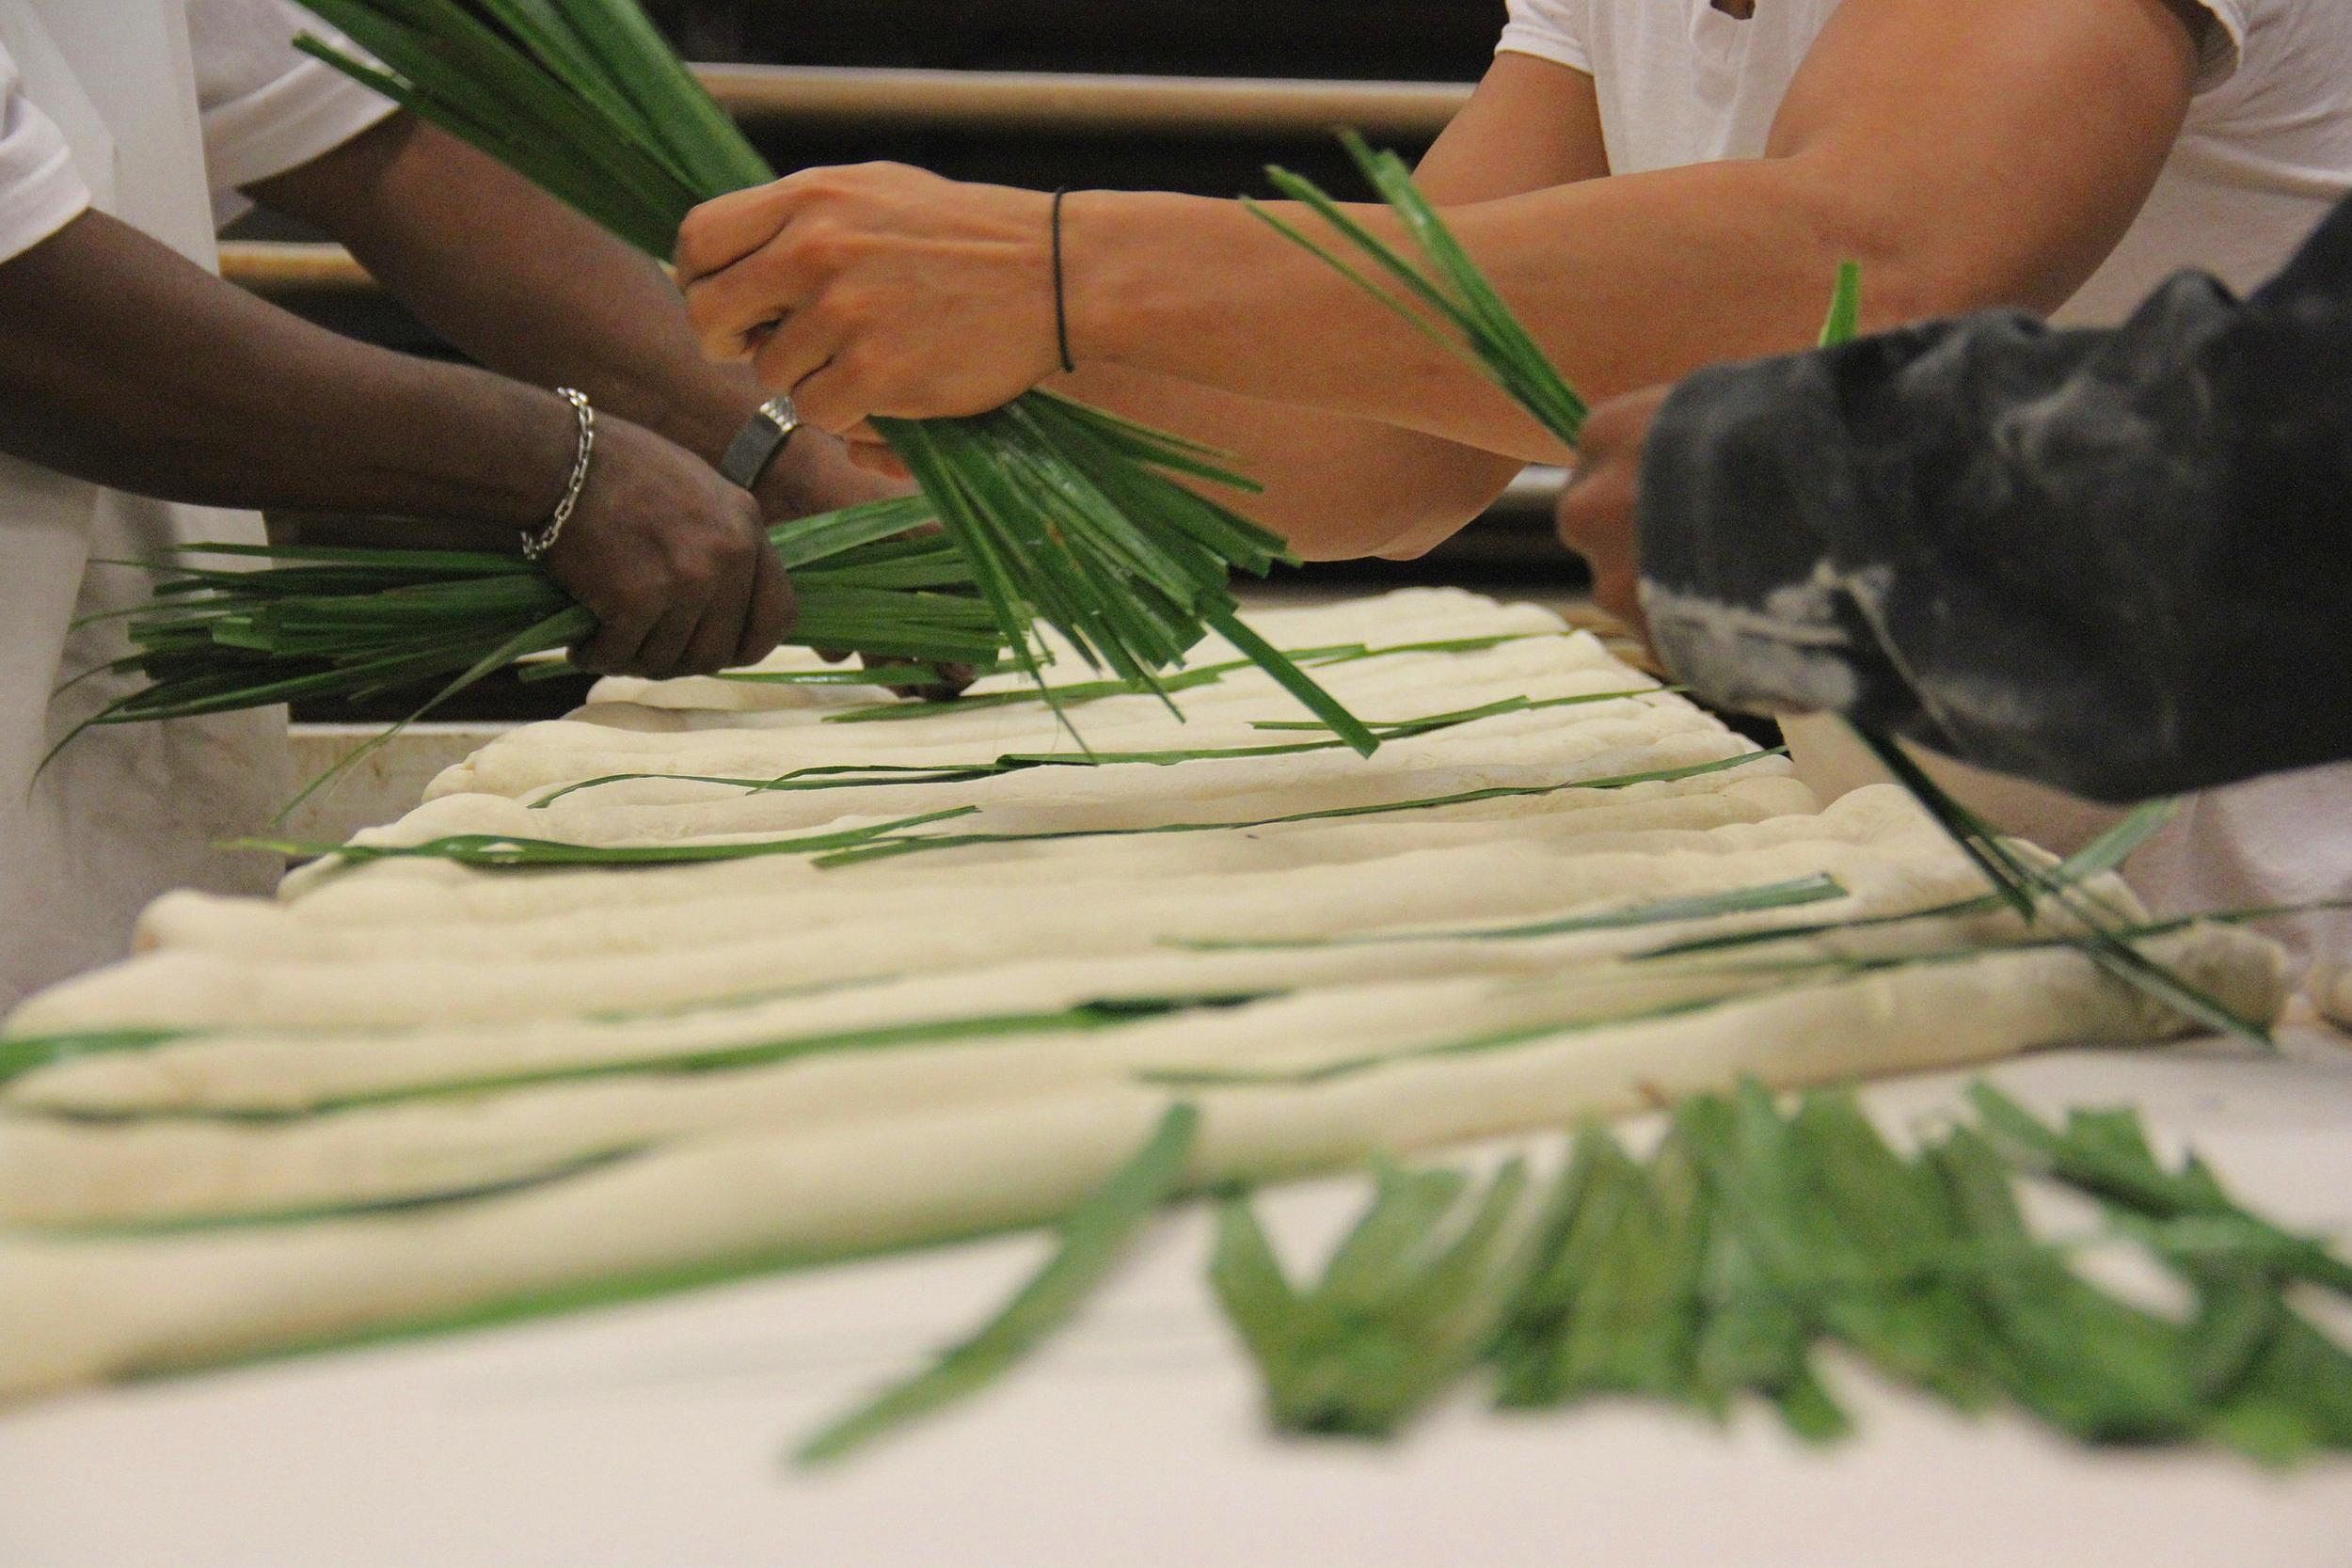 Palmetto leaf is placed on the bread in La Segunda Bakery